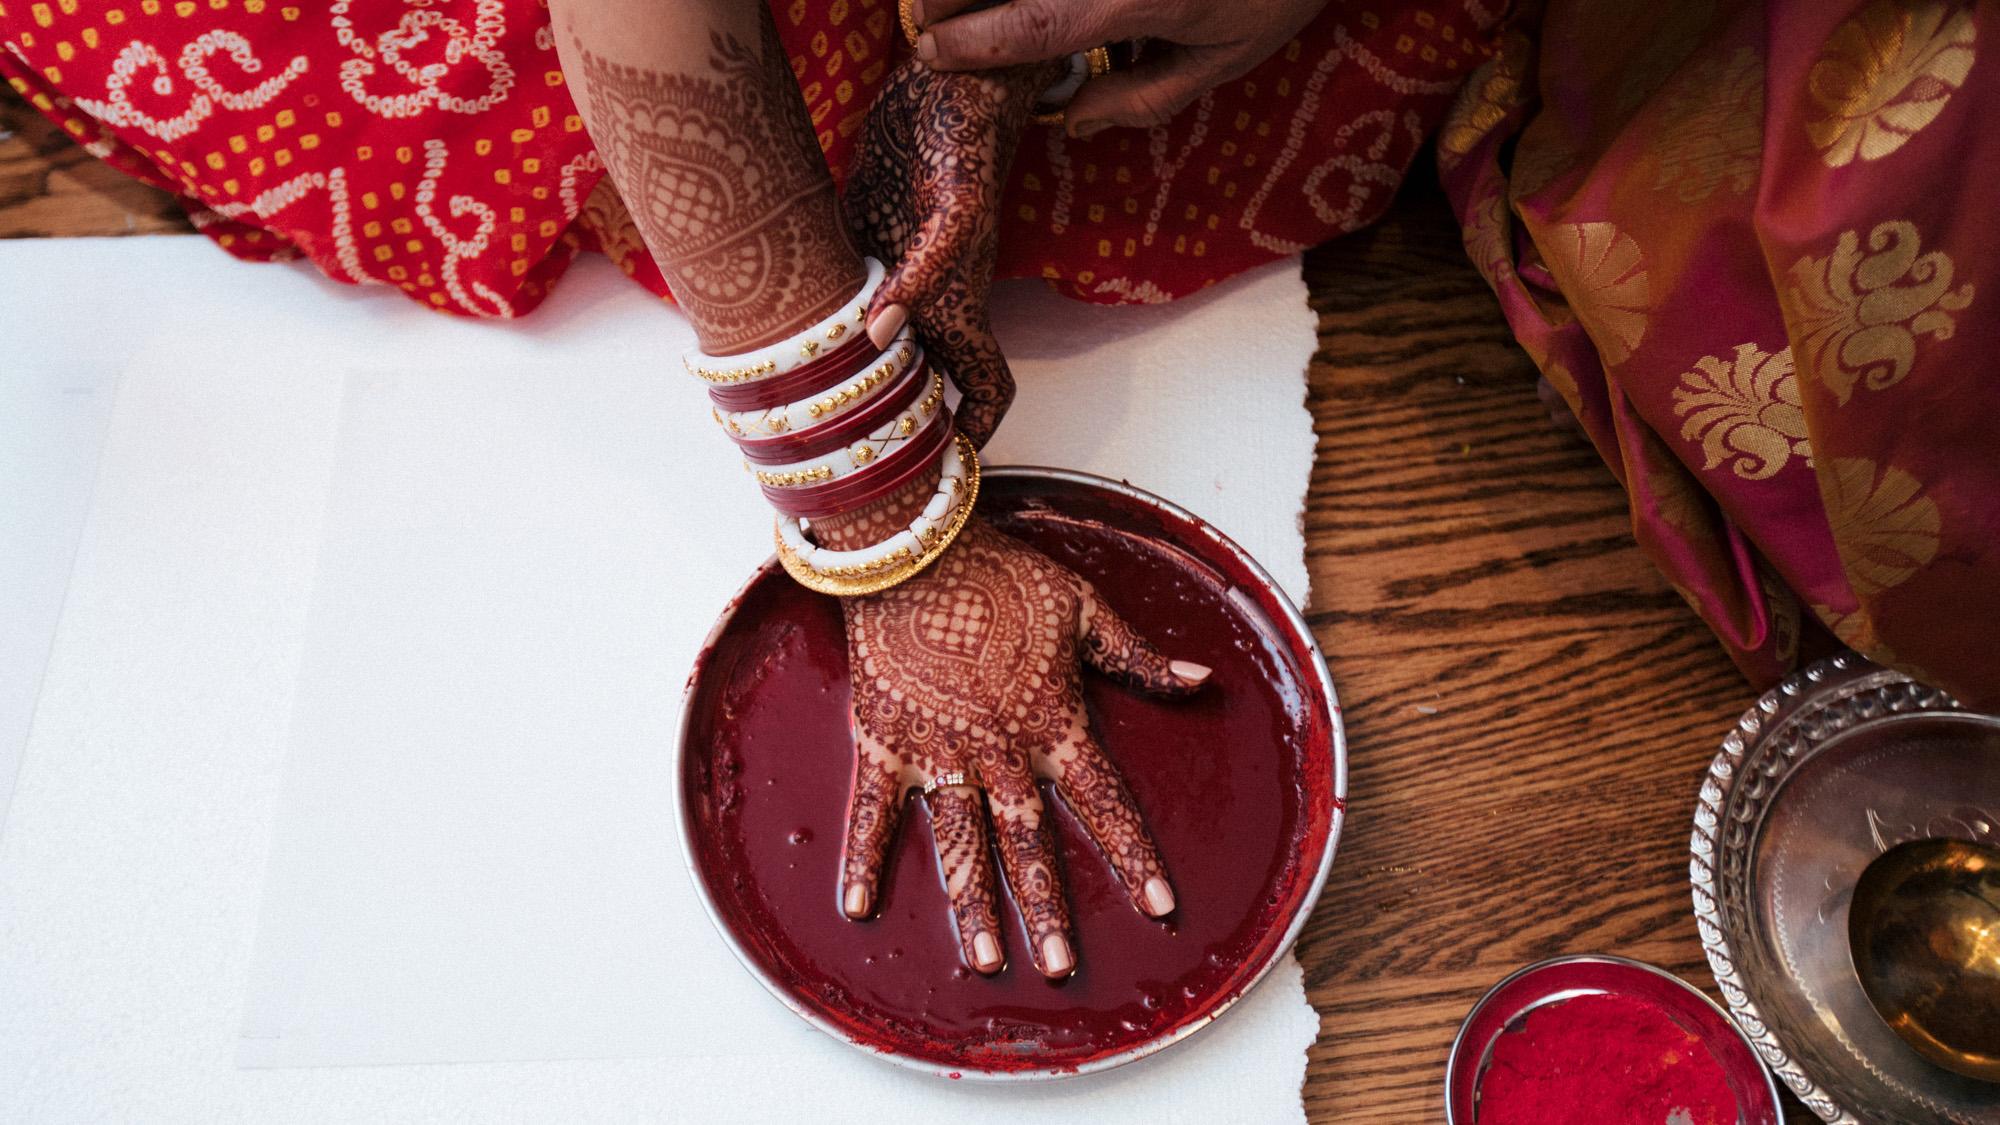 anu_maneesh_alec_vanderboom_Indian_wedding_photography-0194.jpg